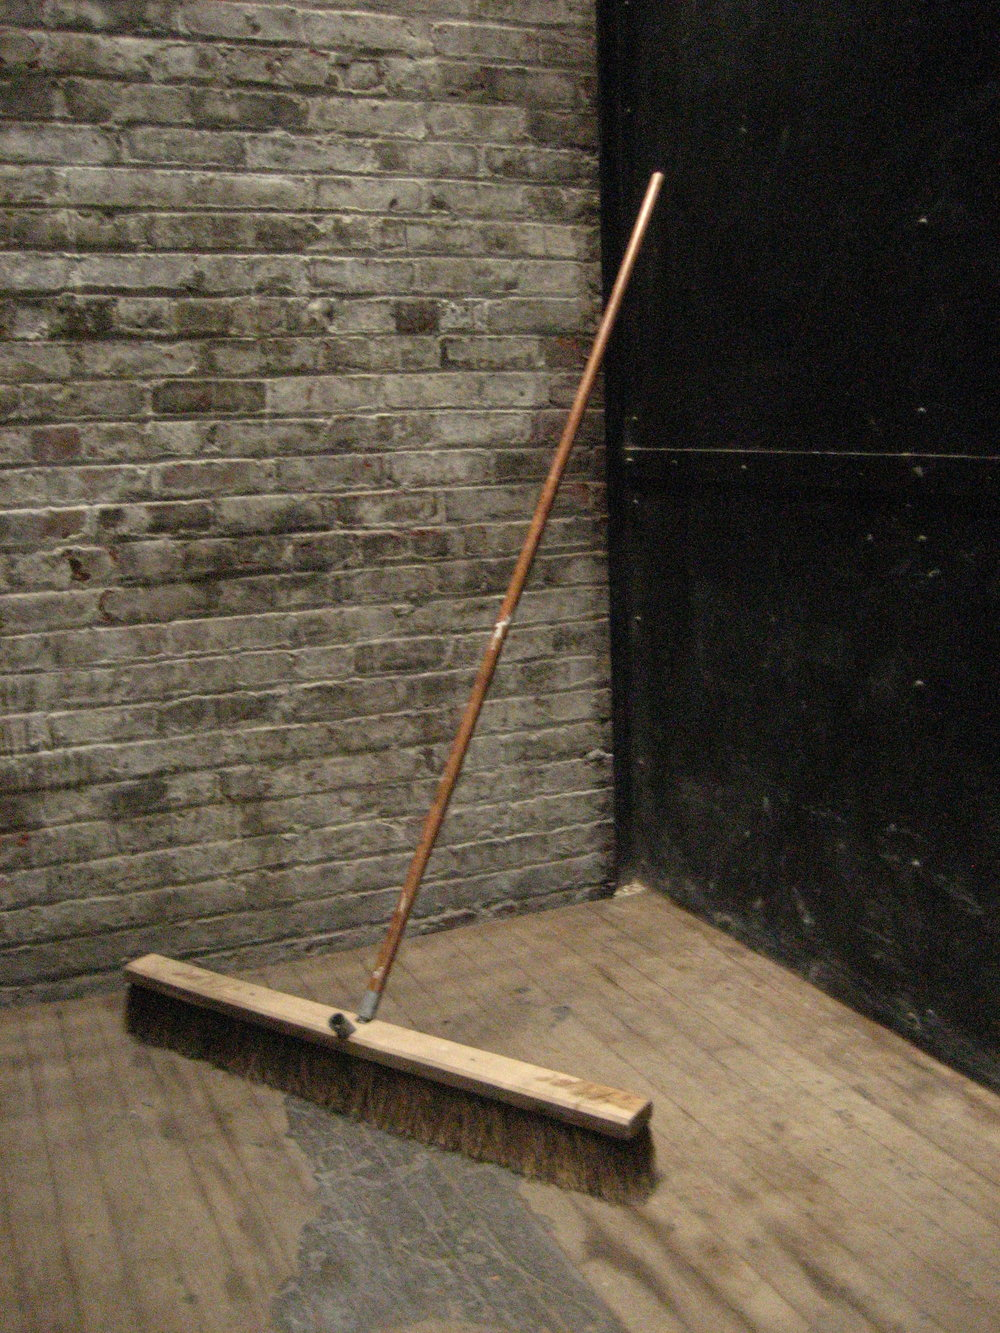 Large wide broom $20